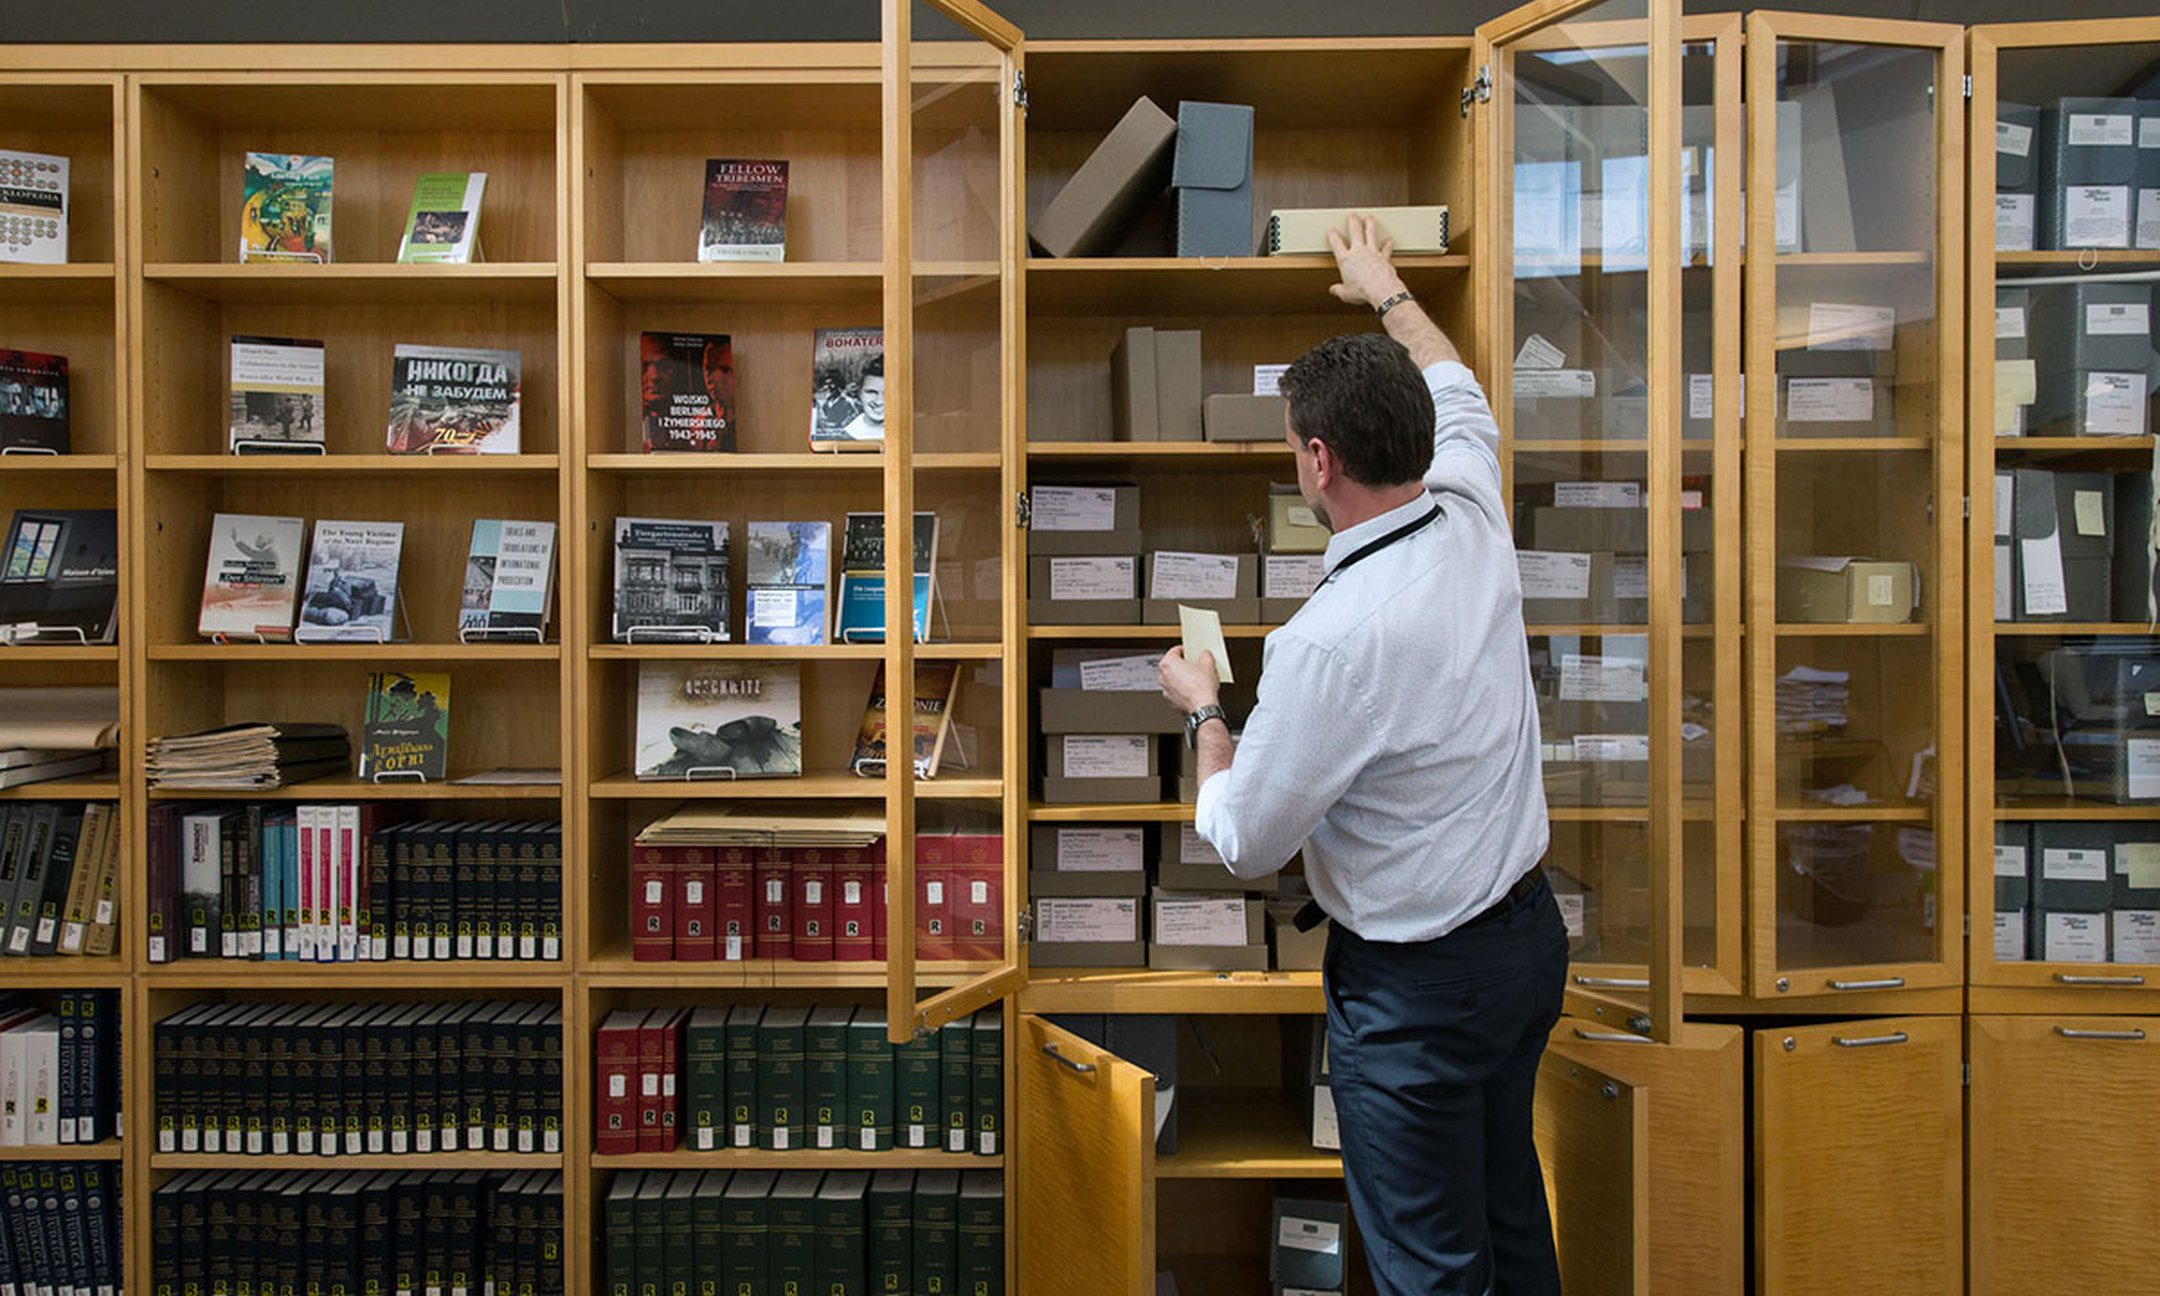 Der Lesesaal des United States Holocaust Memorial Museum in Washington